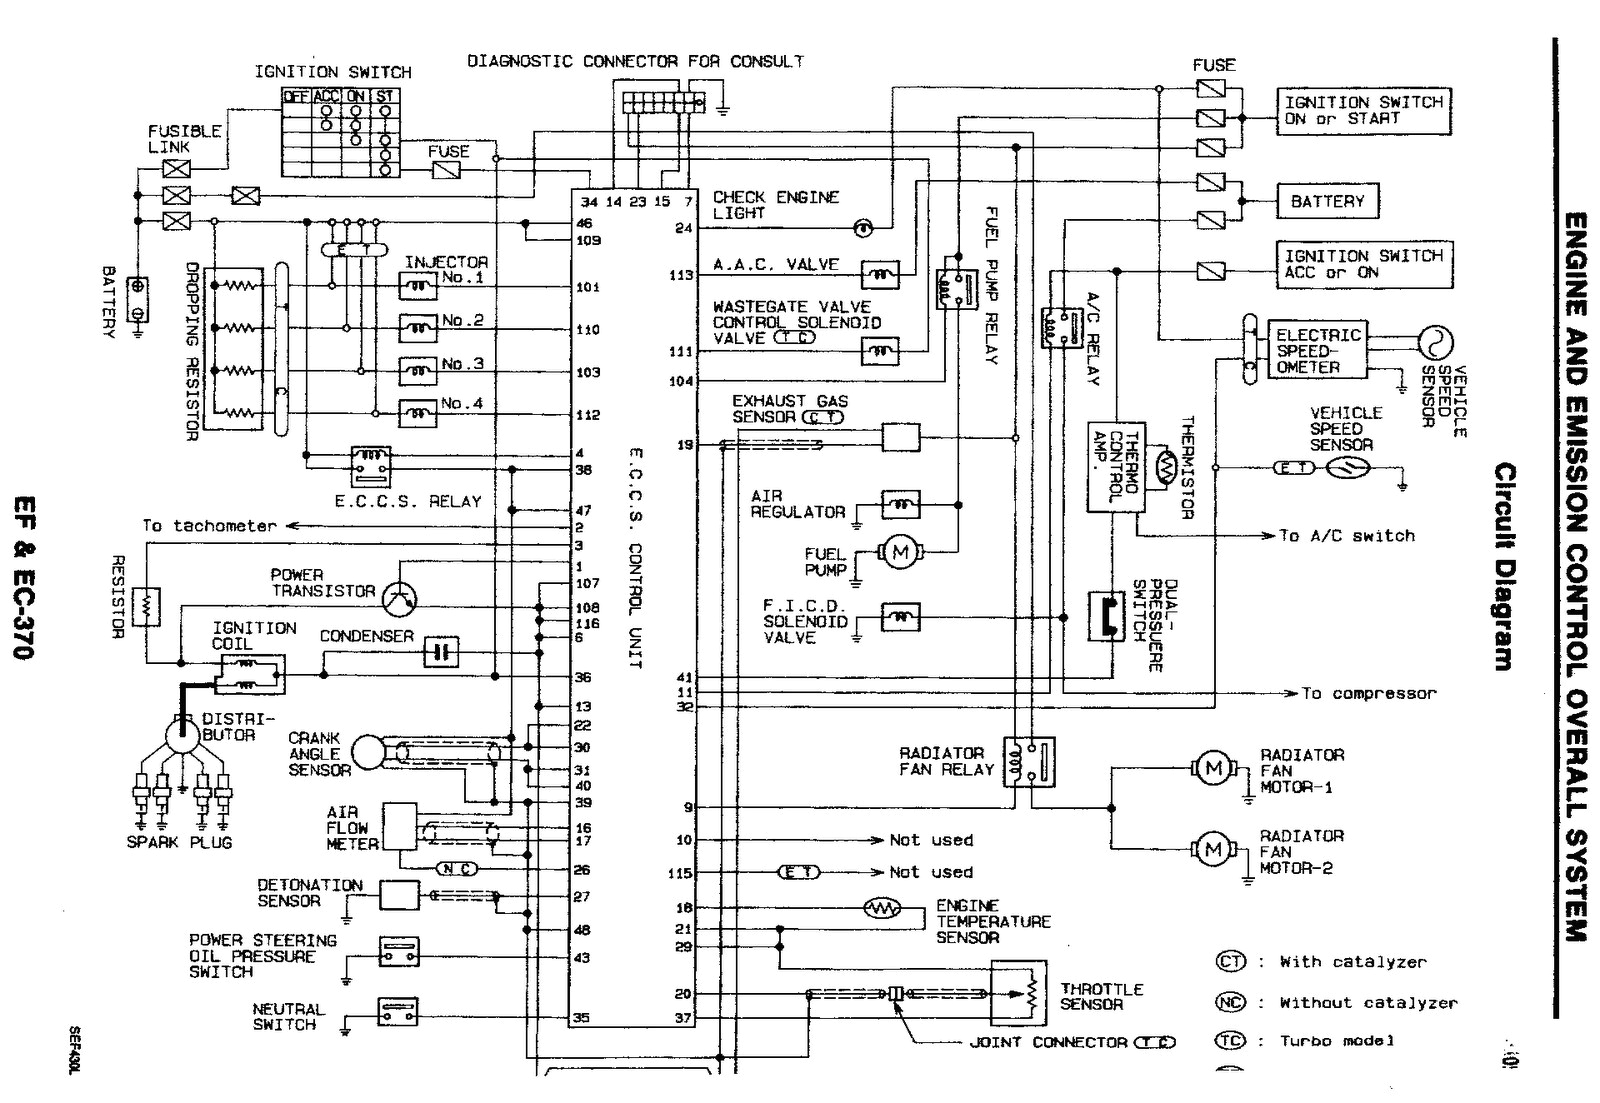 Sr20 Wiring Diagram Wiring Diagram Further Sr20det Wiring Harness Diagram Likewise 1995